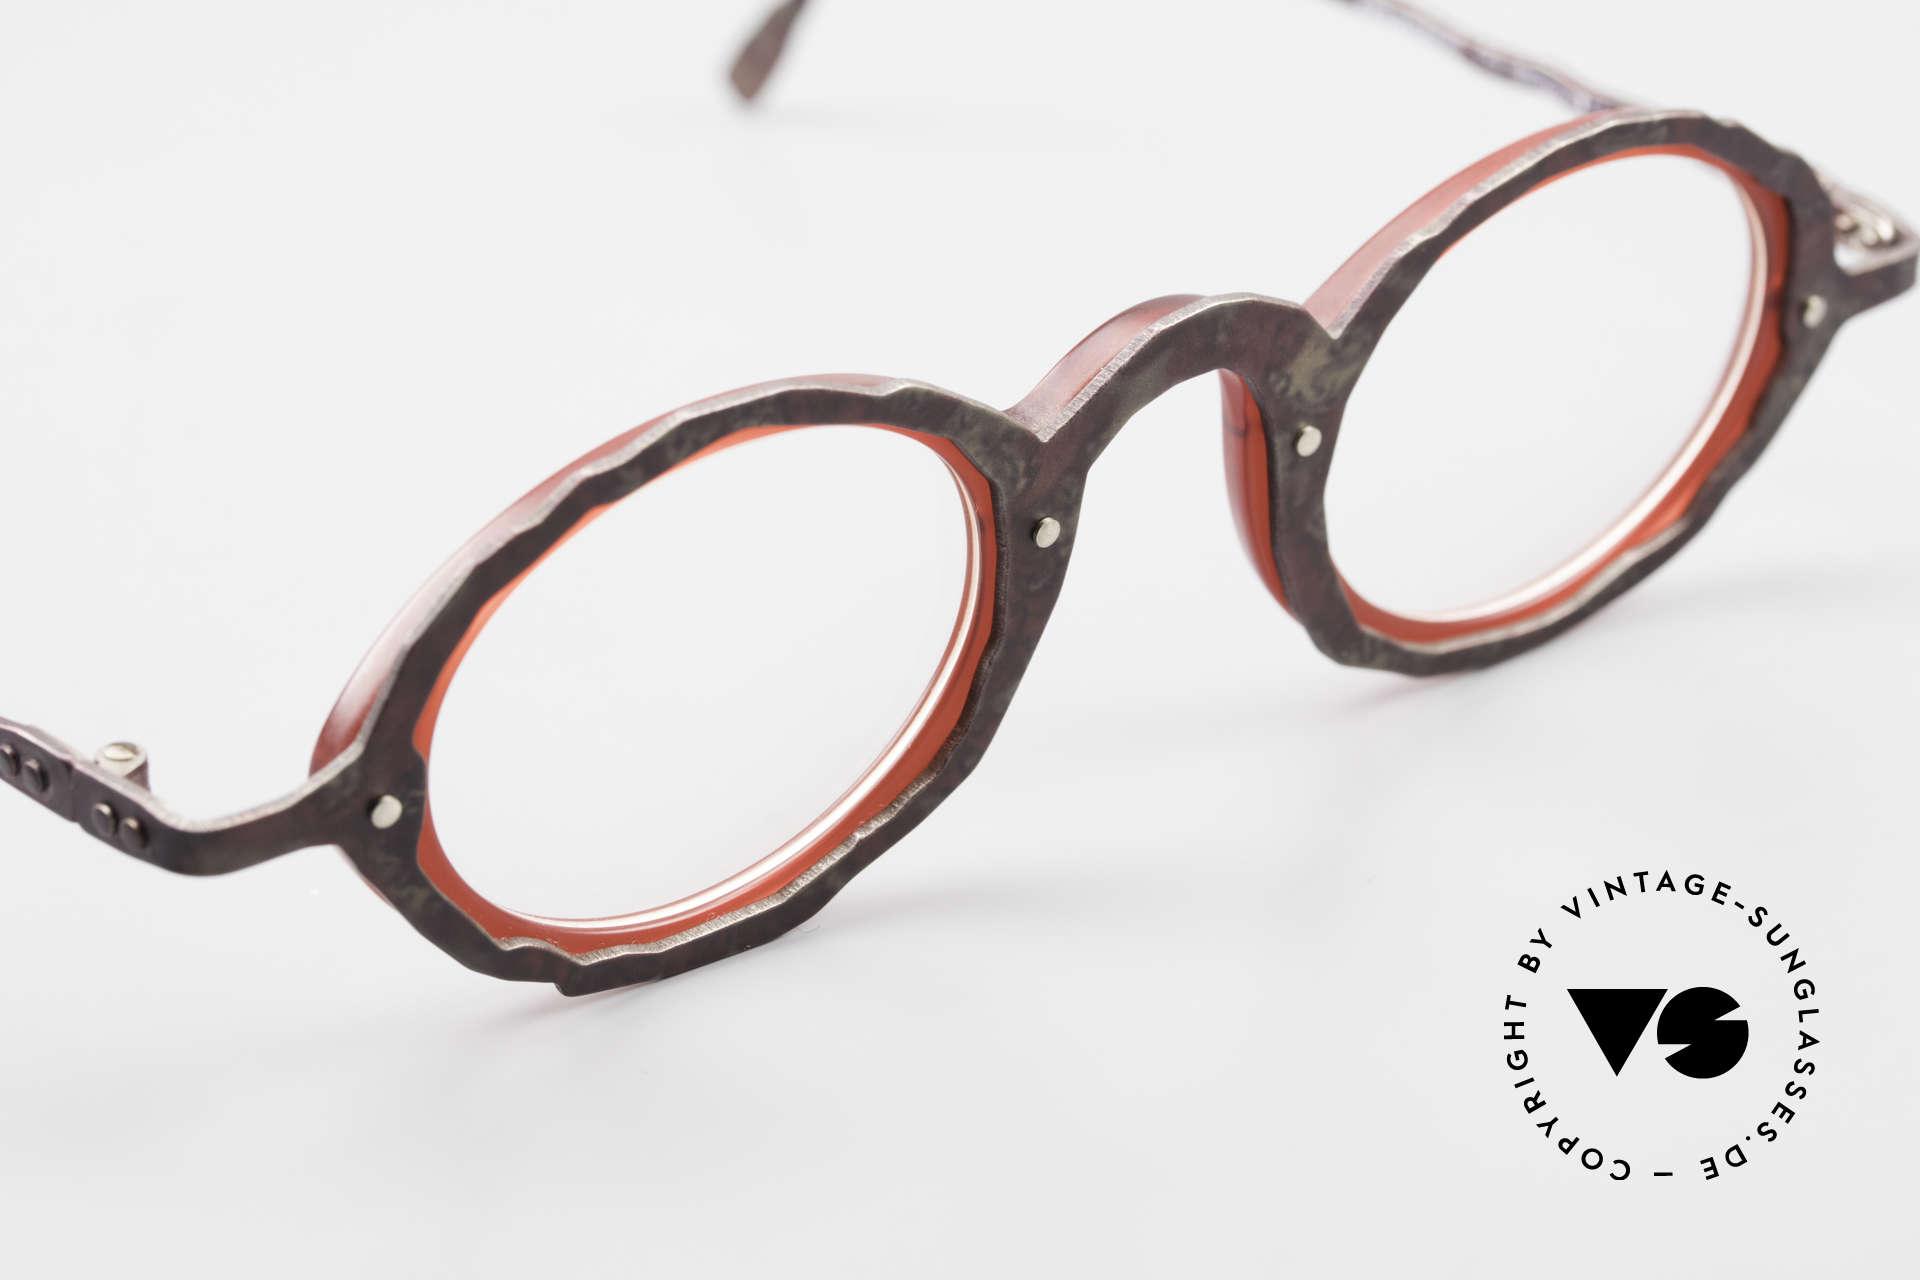 Theo Belgium Eye-Witness GG Avant-Garde Eyeglasses 90's, unworn, one of a kind (like all our vintage Theo eyewear), Made for Men and Women